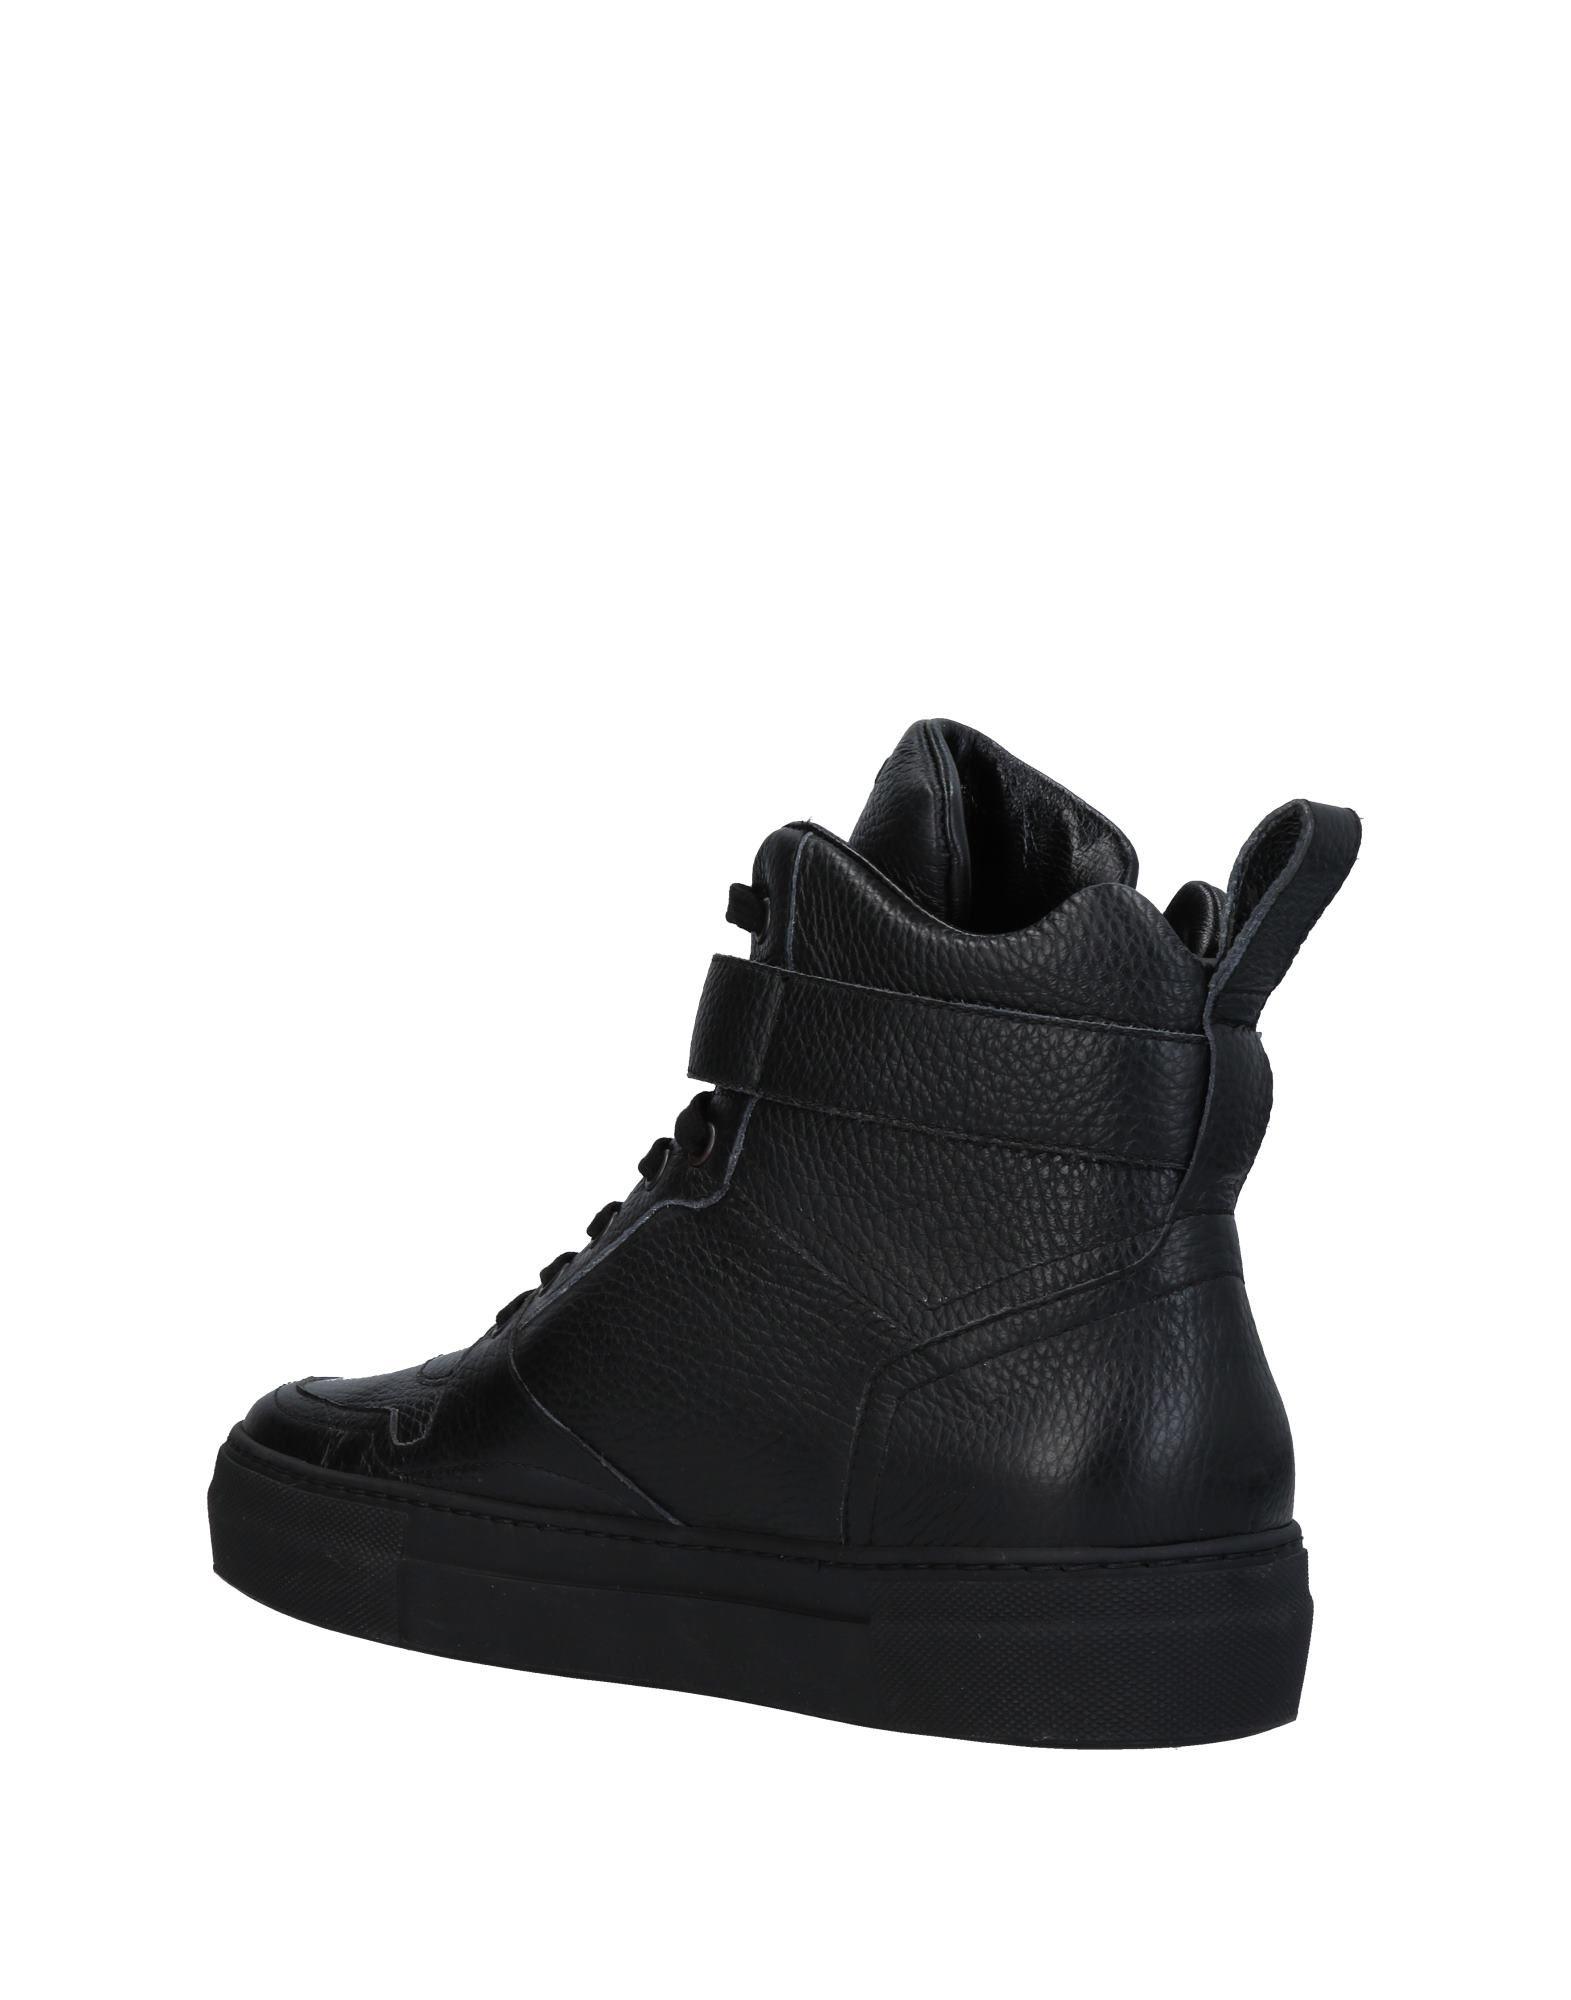 Dibrera By Paolo Zanoli Gute Sneakers Herren  11446168QE Gute Zanoli Qualität beliebte Schuhe 64c804